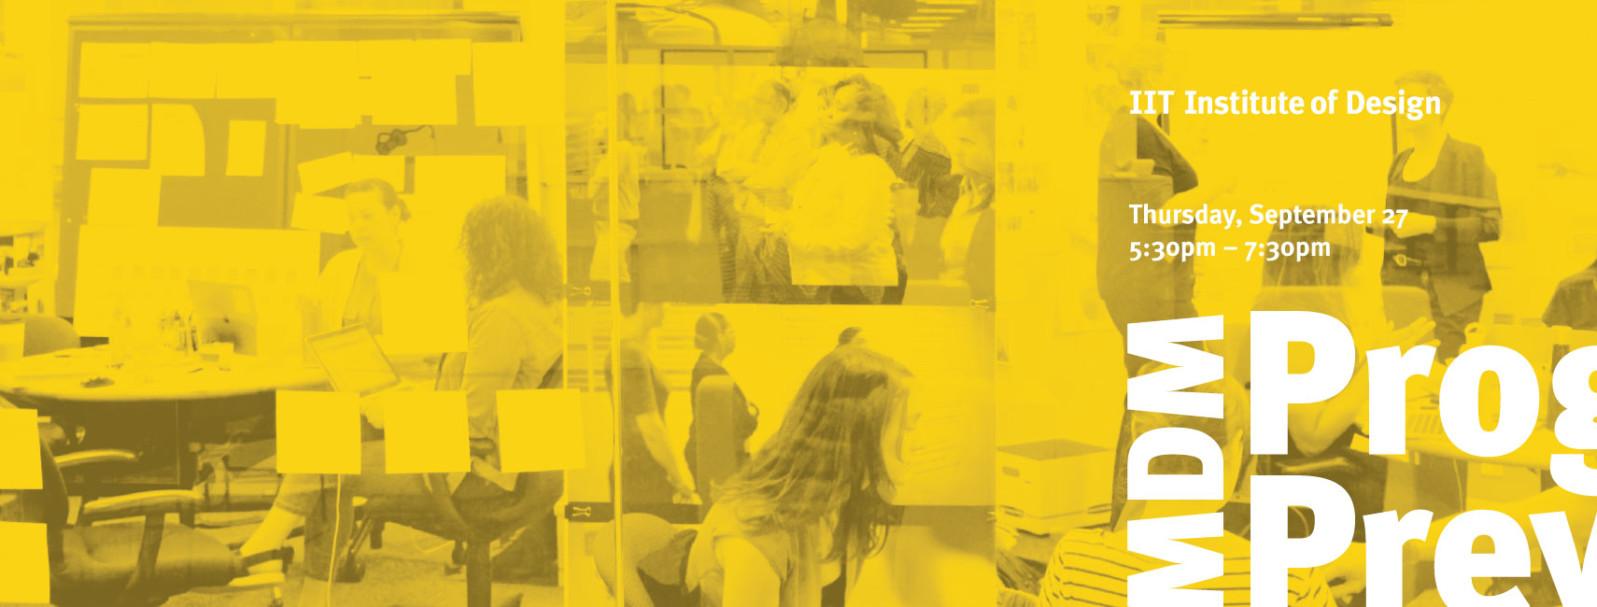 IIT Institute of Design - Master of Design Methods Program Preview